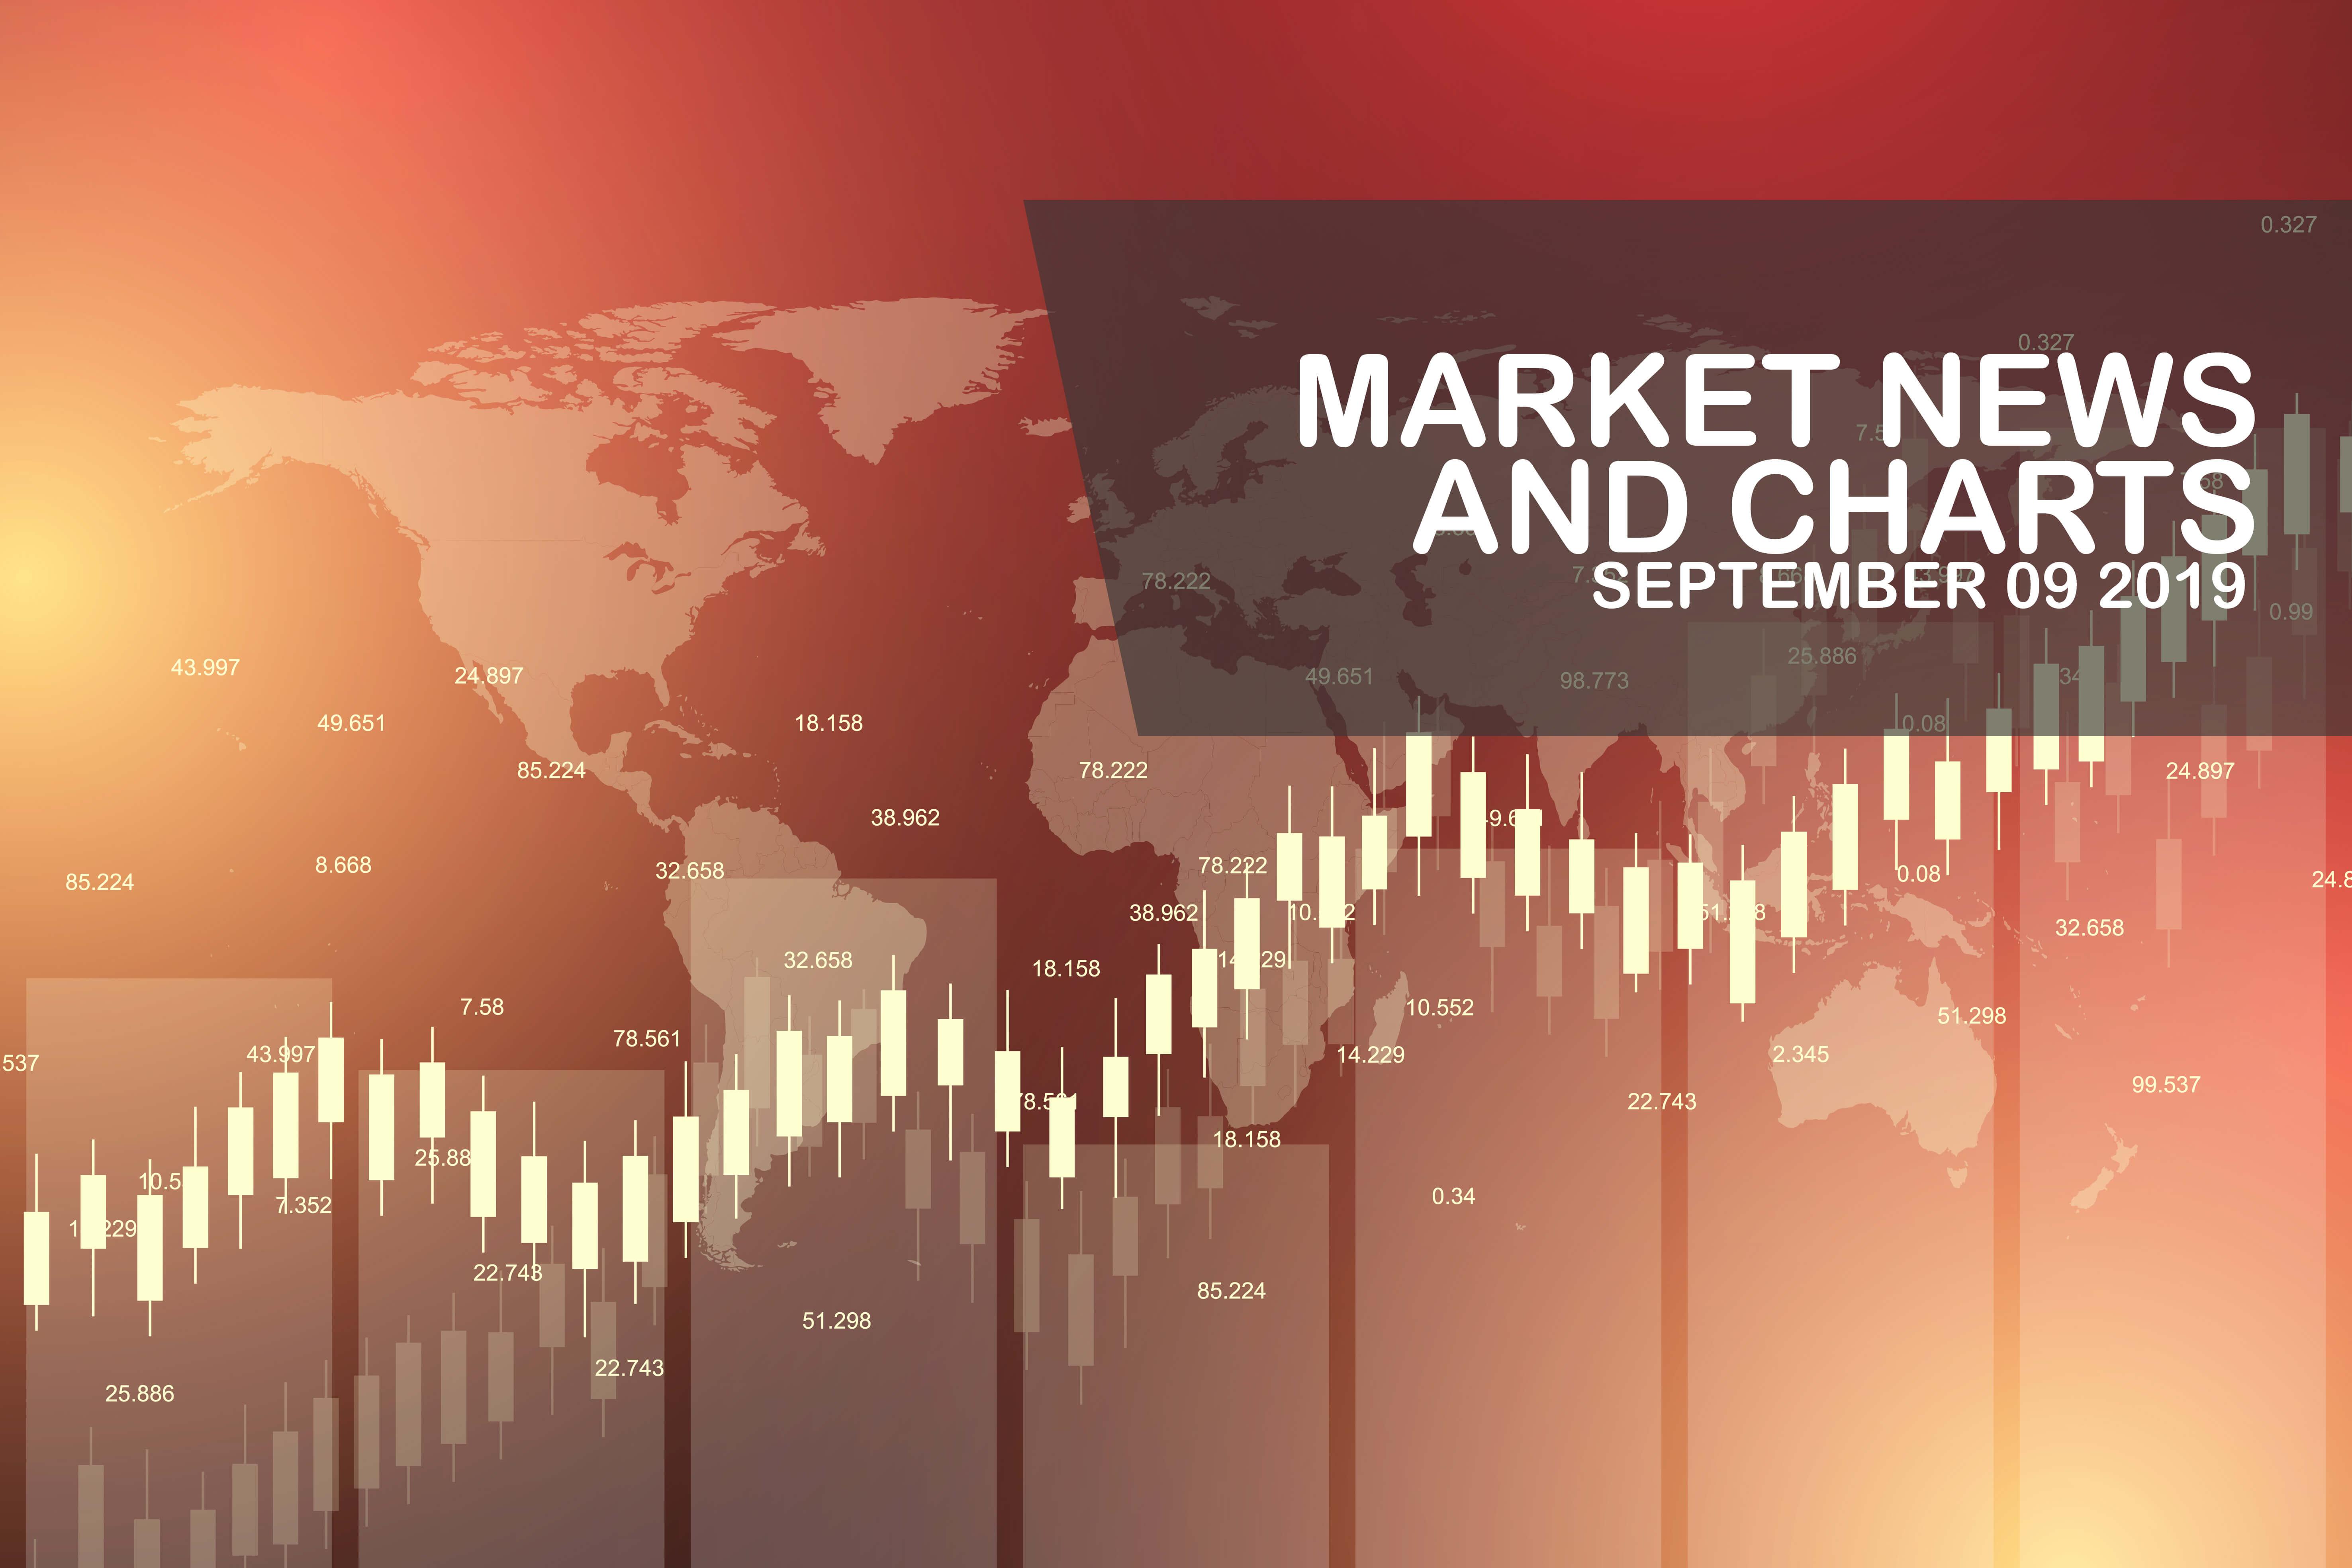 Market-News-and-Charts-September-10-2019-Finance-Brokerage